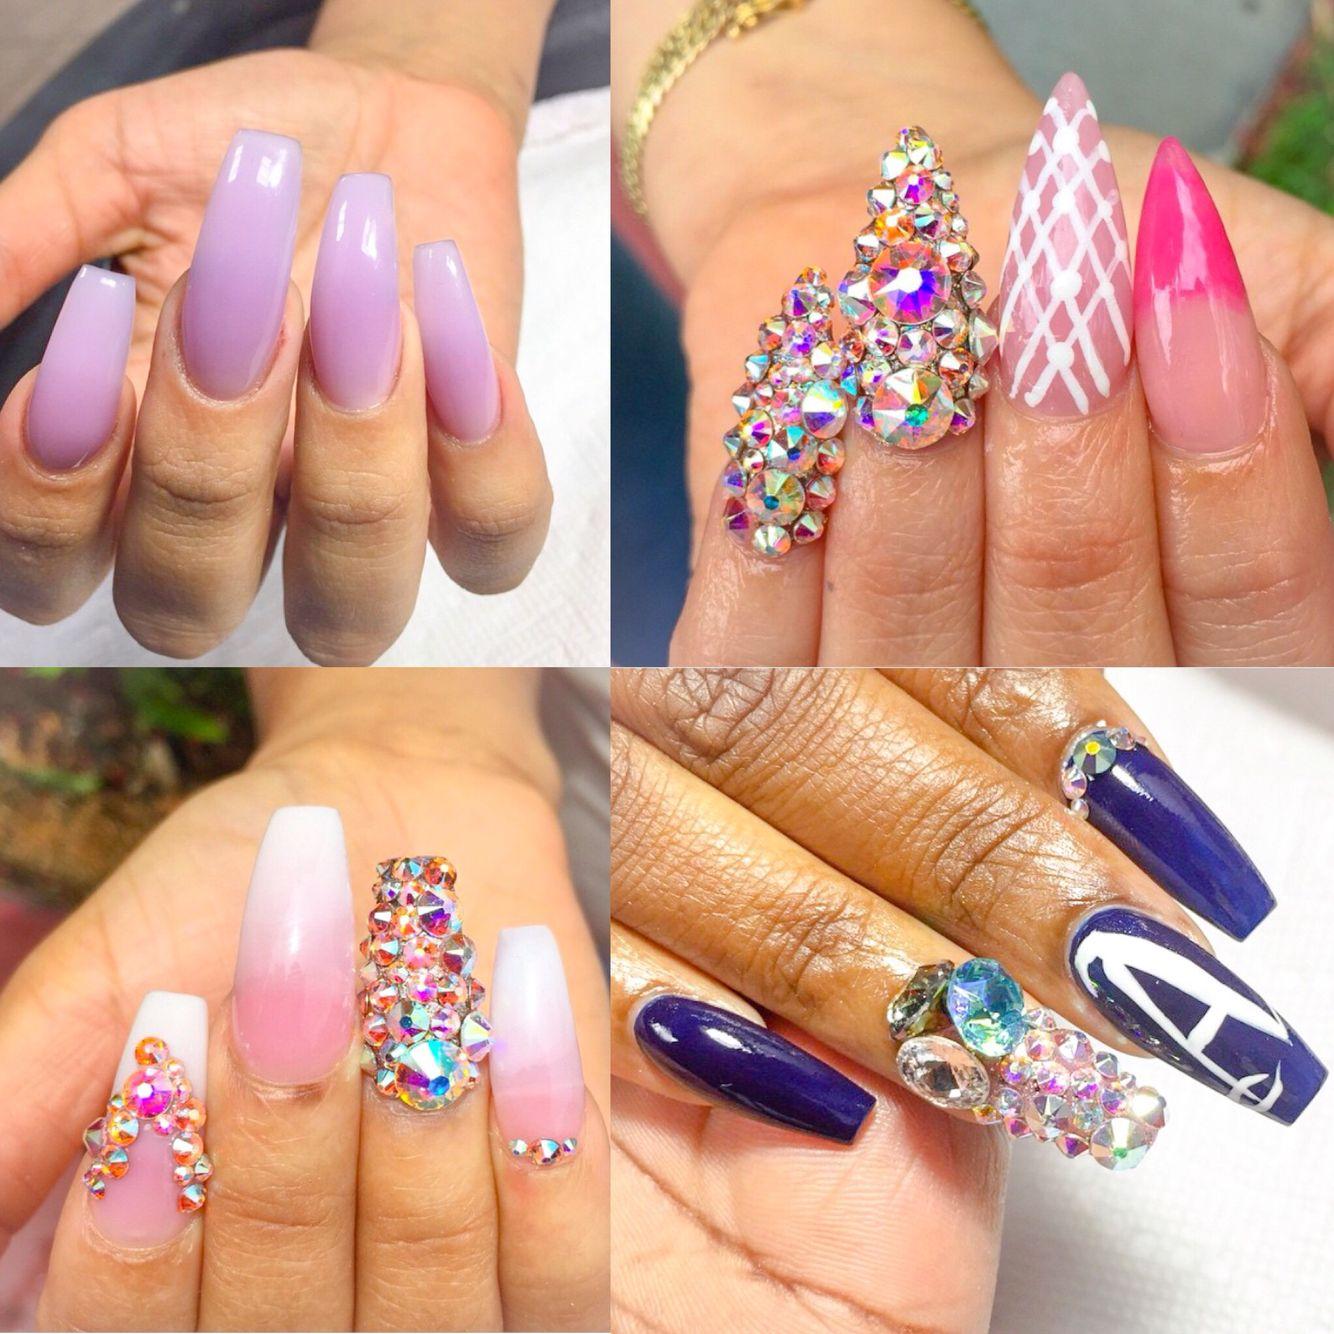 ✨ By: @lady_bubblez18 ---------------------------------------------------------- #nails #nail #notd #style #hudabeauty #cute #beauty #beautiful #instagood #pretty #girl #girls #stylish #sparkles #styles #gliter #nailart #opi  #essie #unhas #preto #branco #rosa #love #shiny #polish #nailpolish #nailswag #anastasiabeverlyhills #vegas_nay